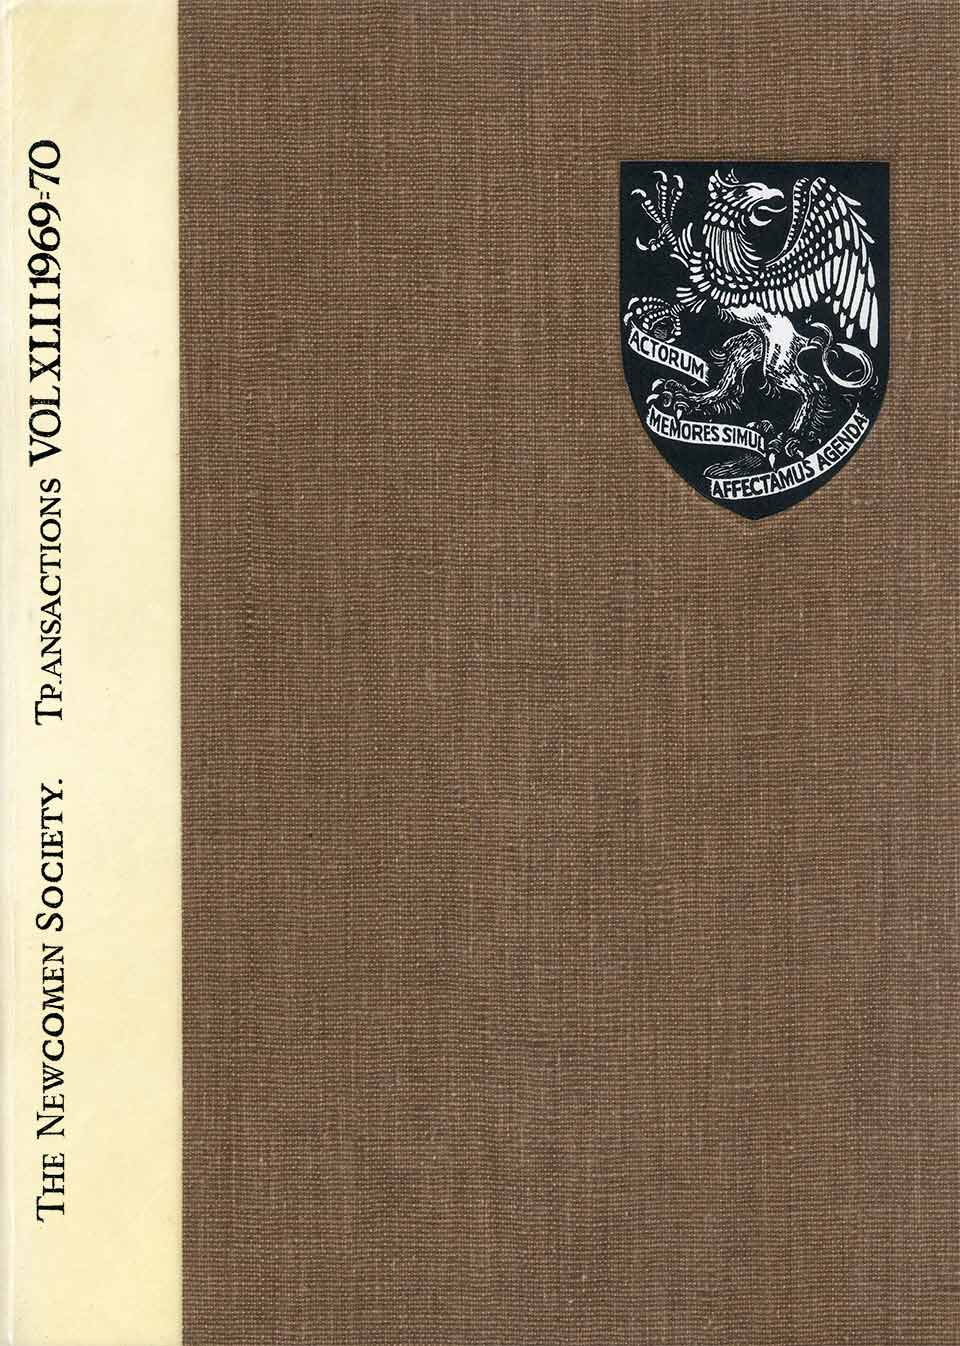 The Journal - V42 No1 1969-70 - cover Hardback